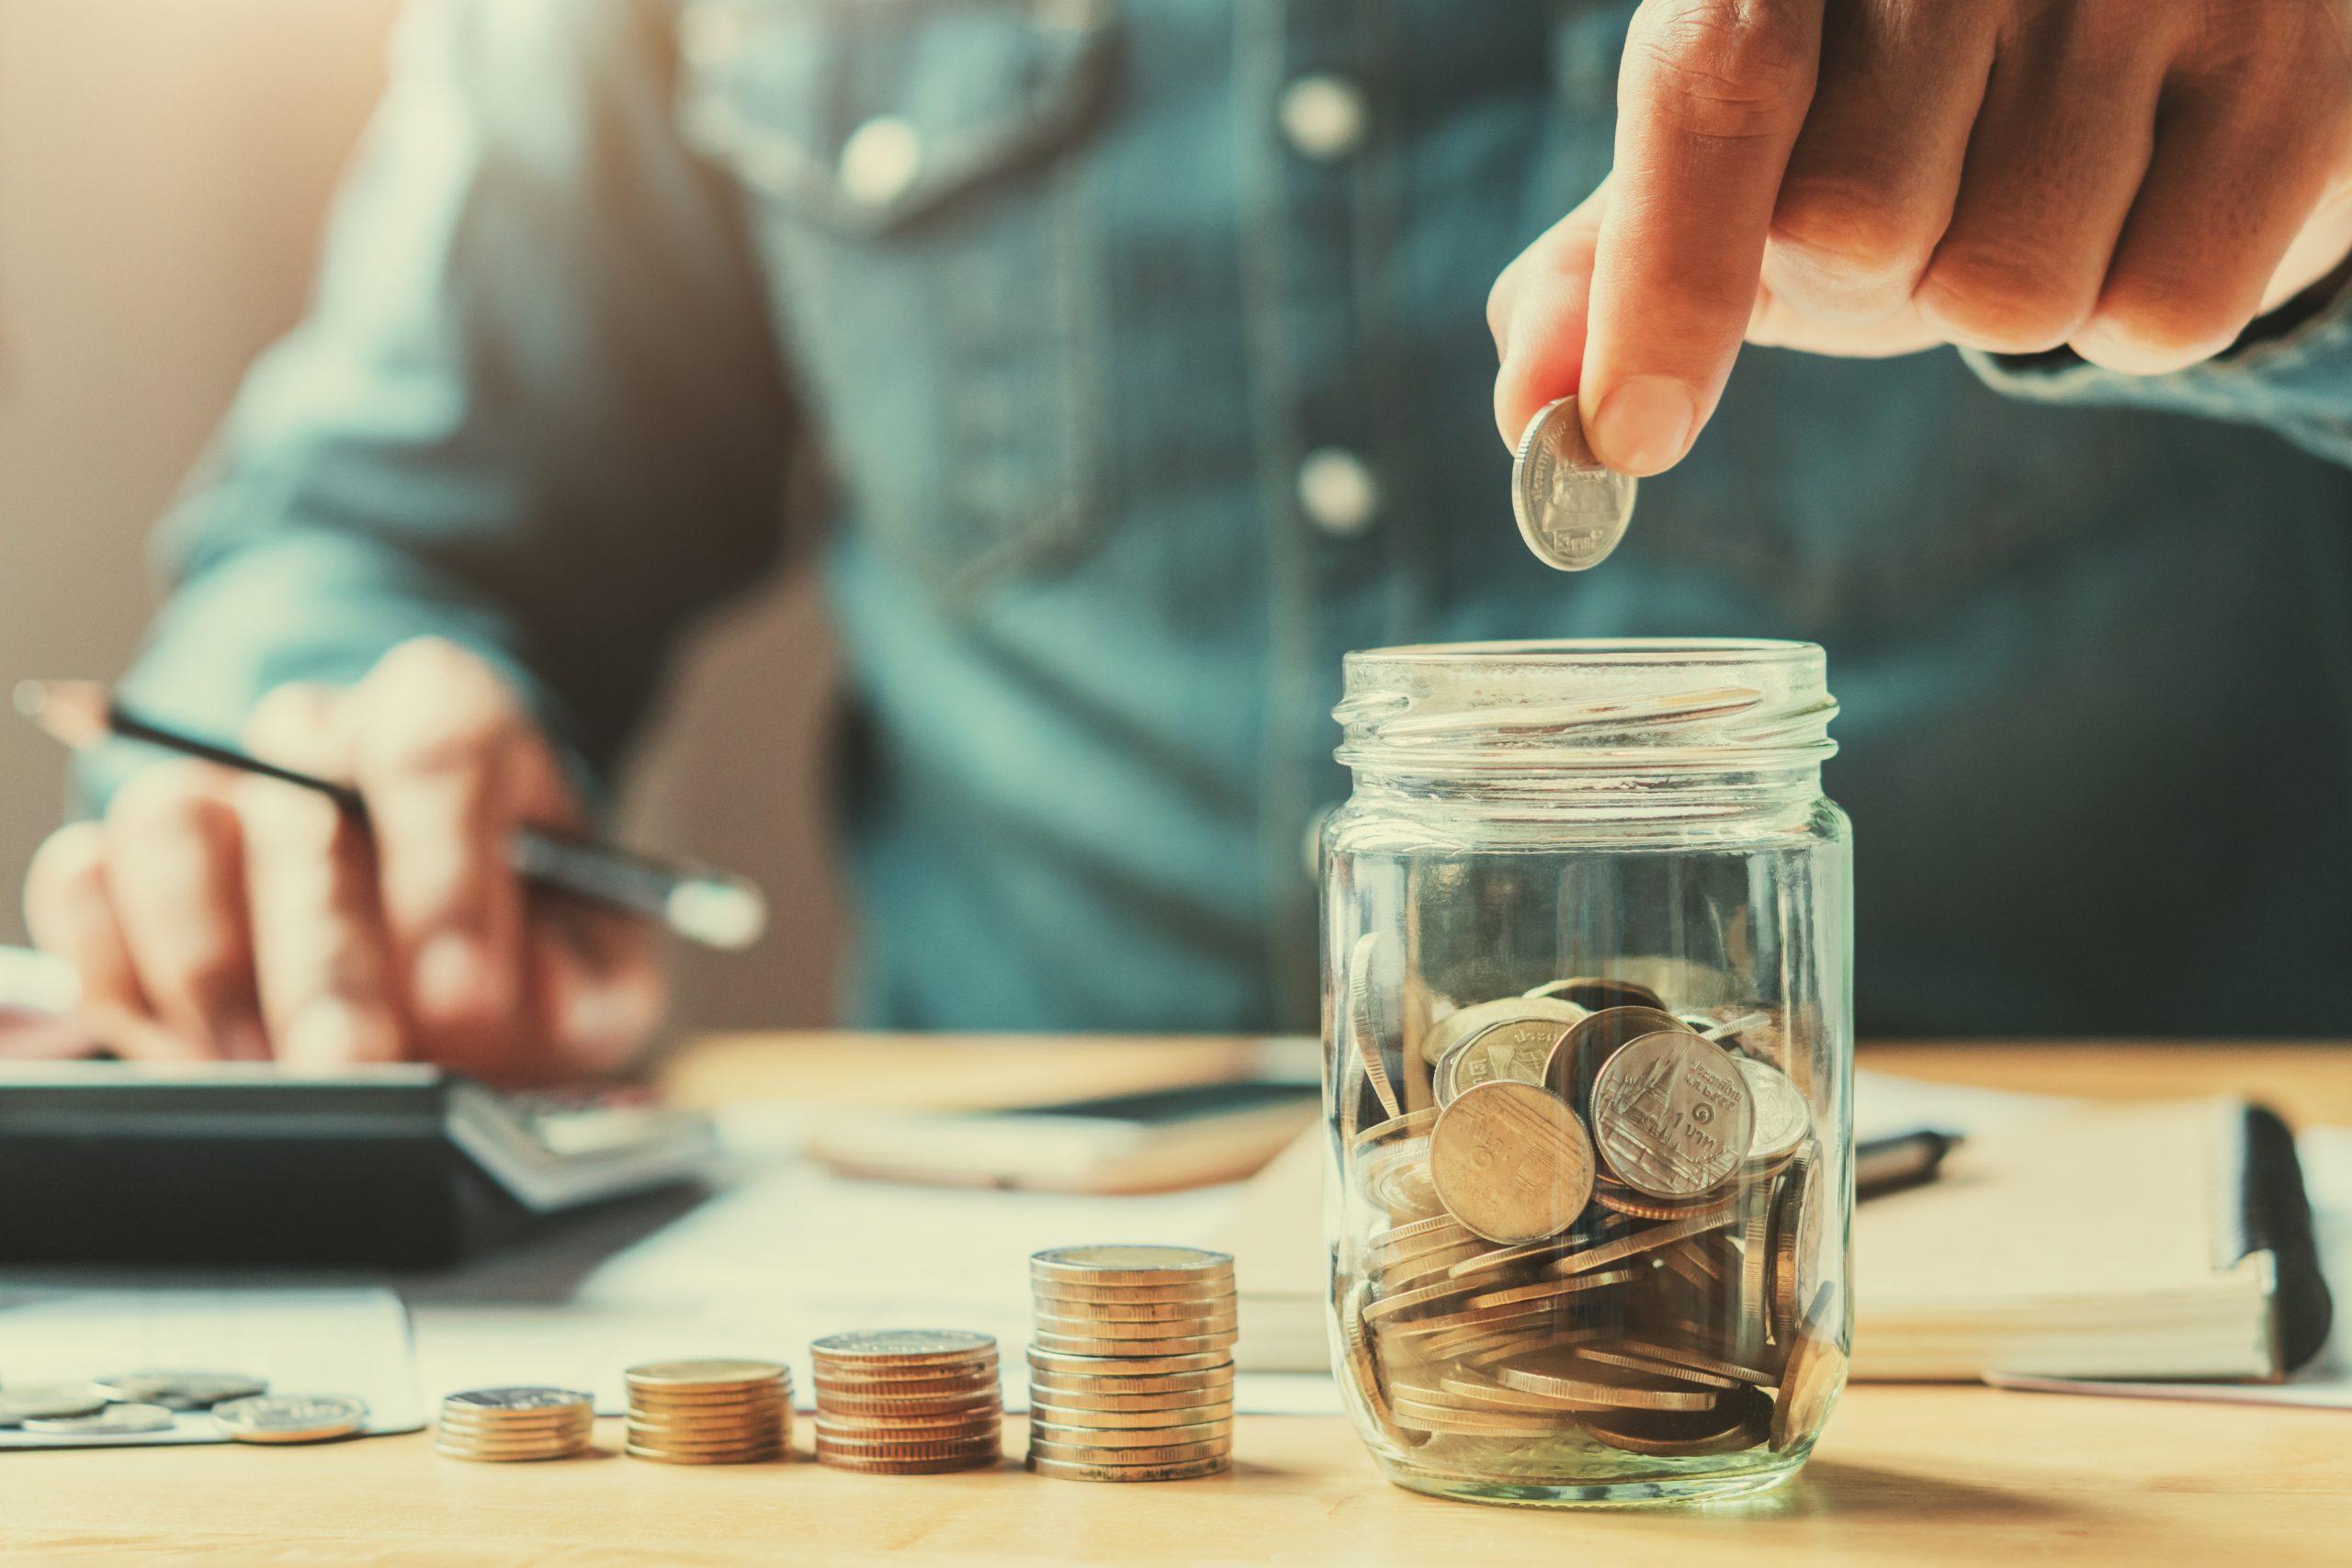 No Income Tax Liability for 2020: Make Sure You Consider the Economics